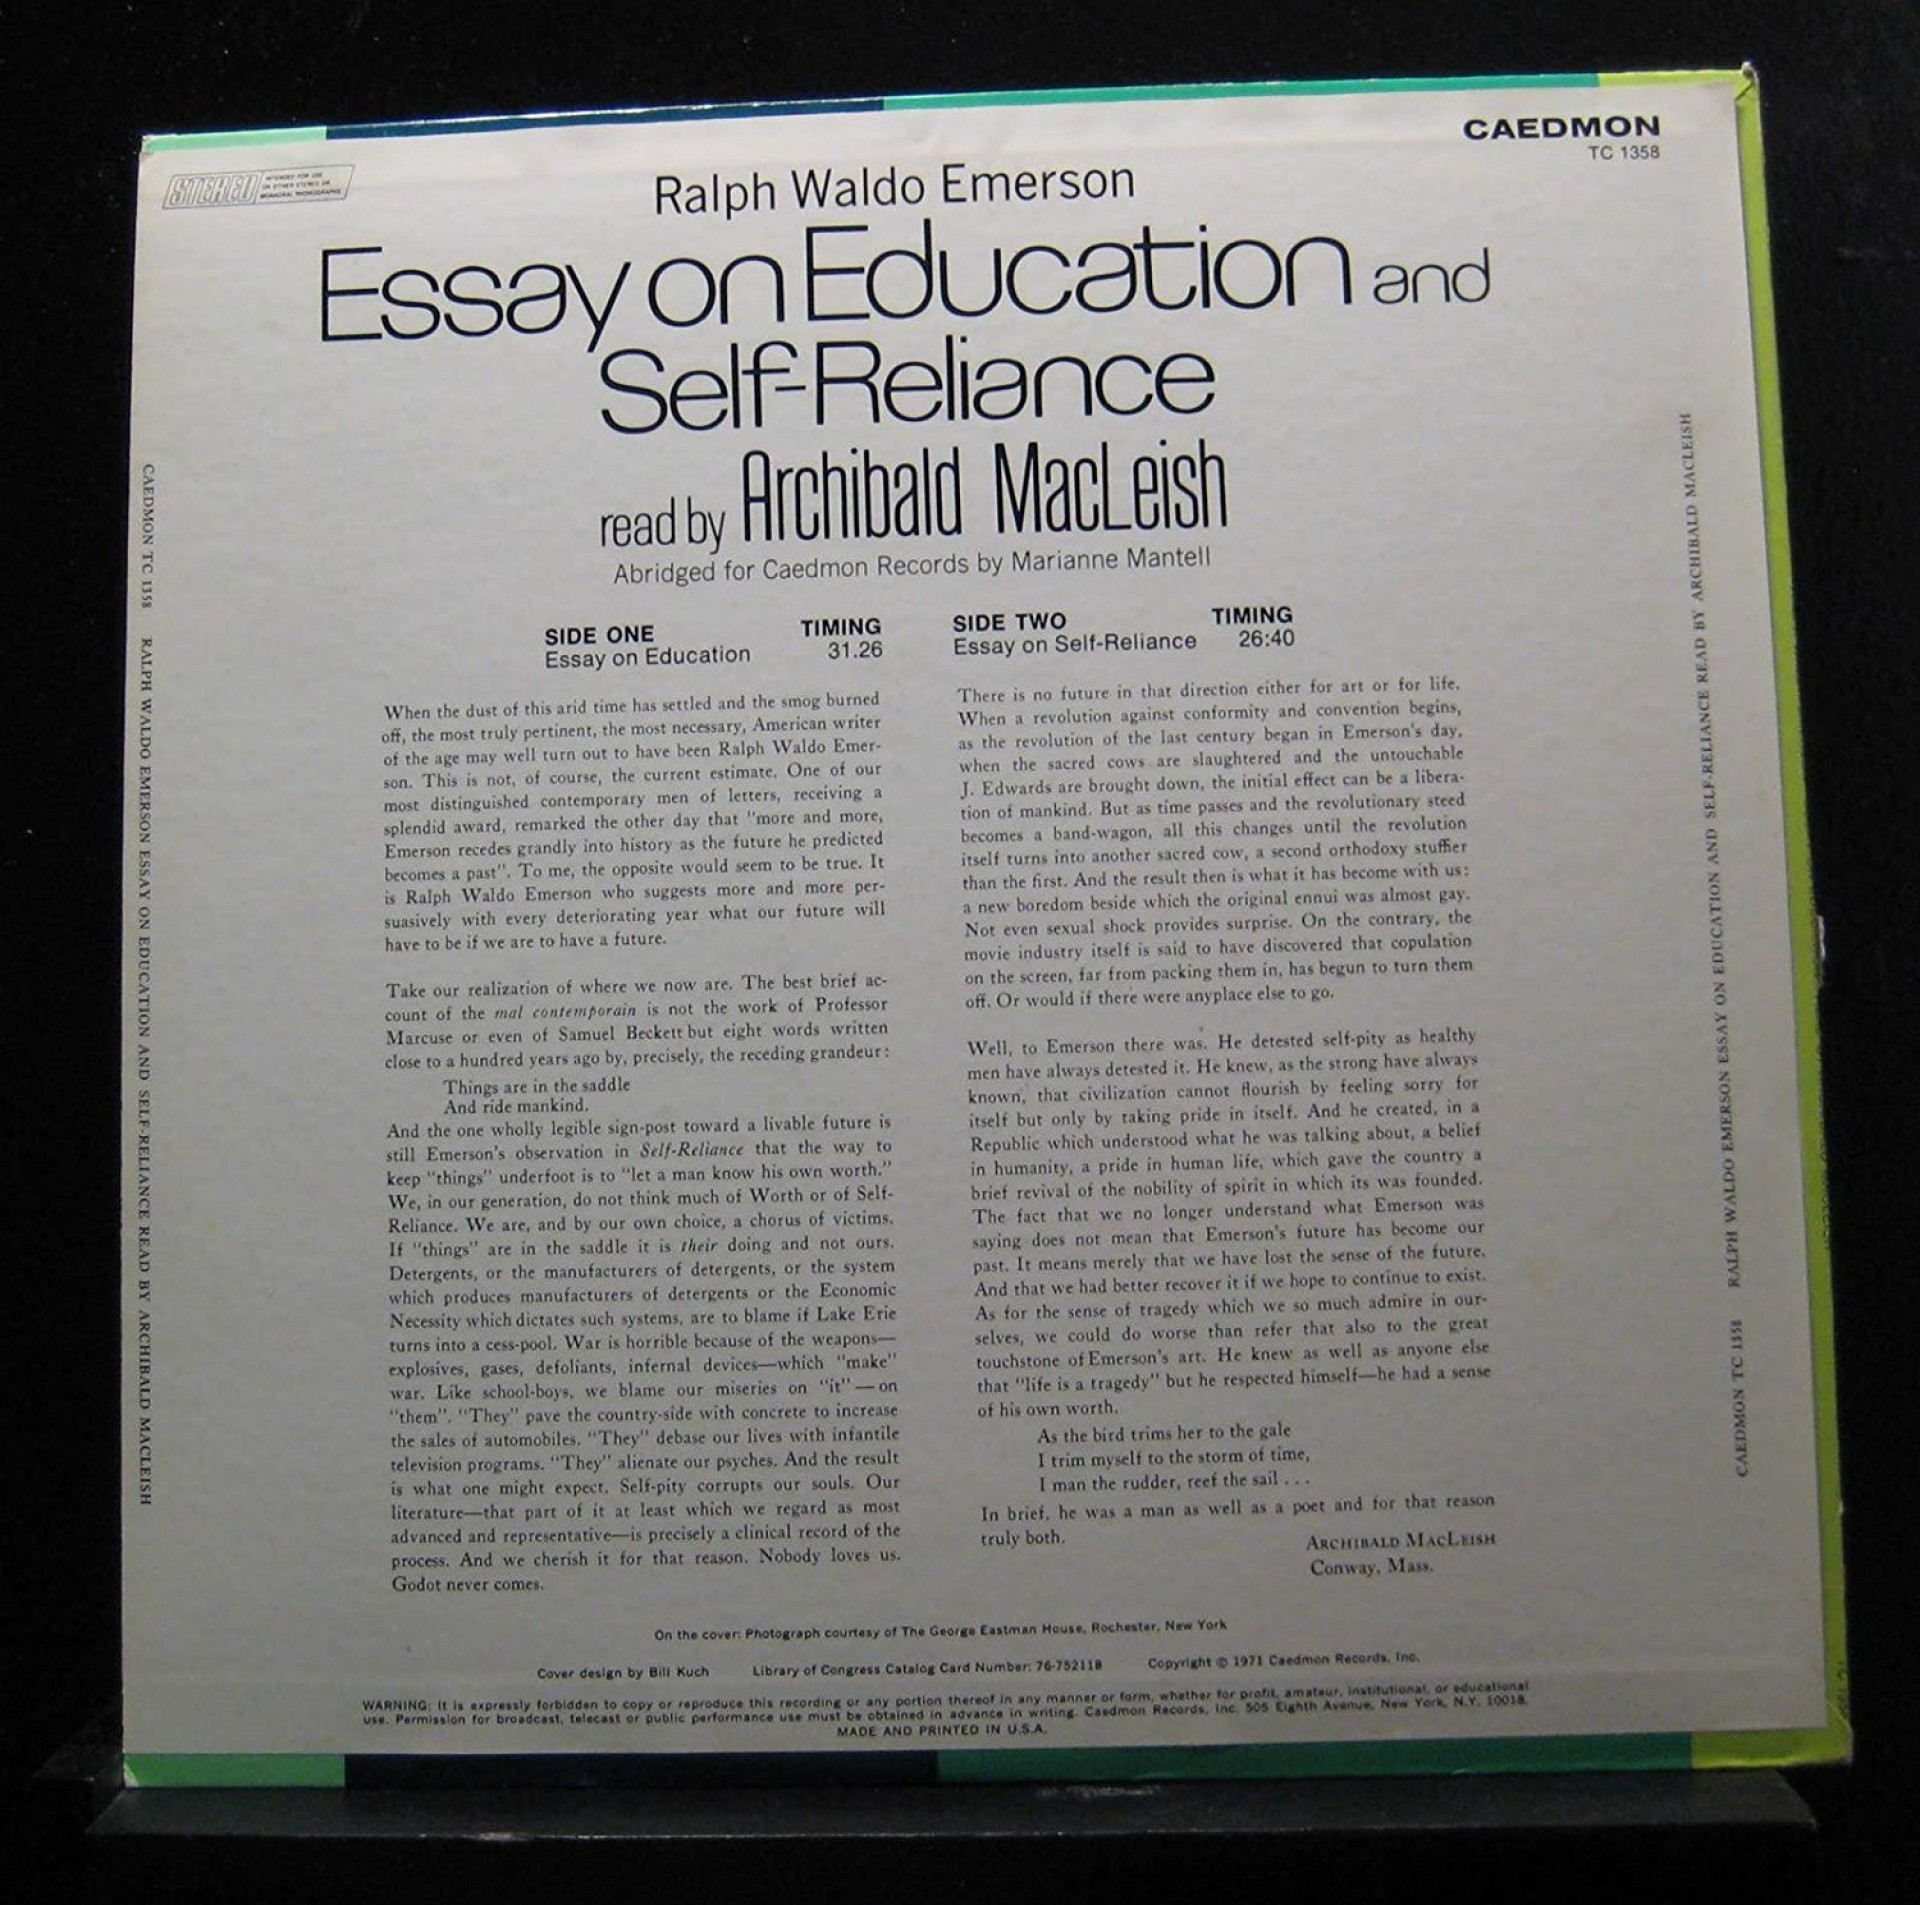 018 81ygqo7iyql  Sl1500 Emerson Self Reliance Essay Staggering Summary Translated Into Modern English Analysis1920